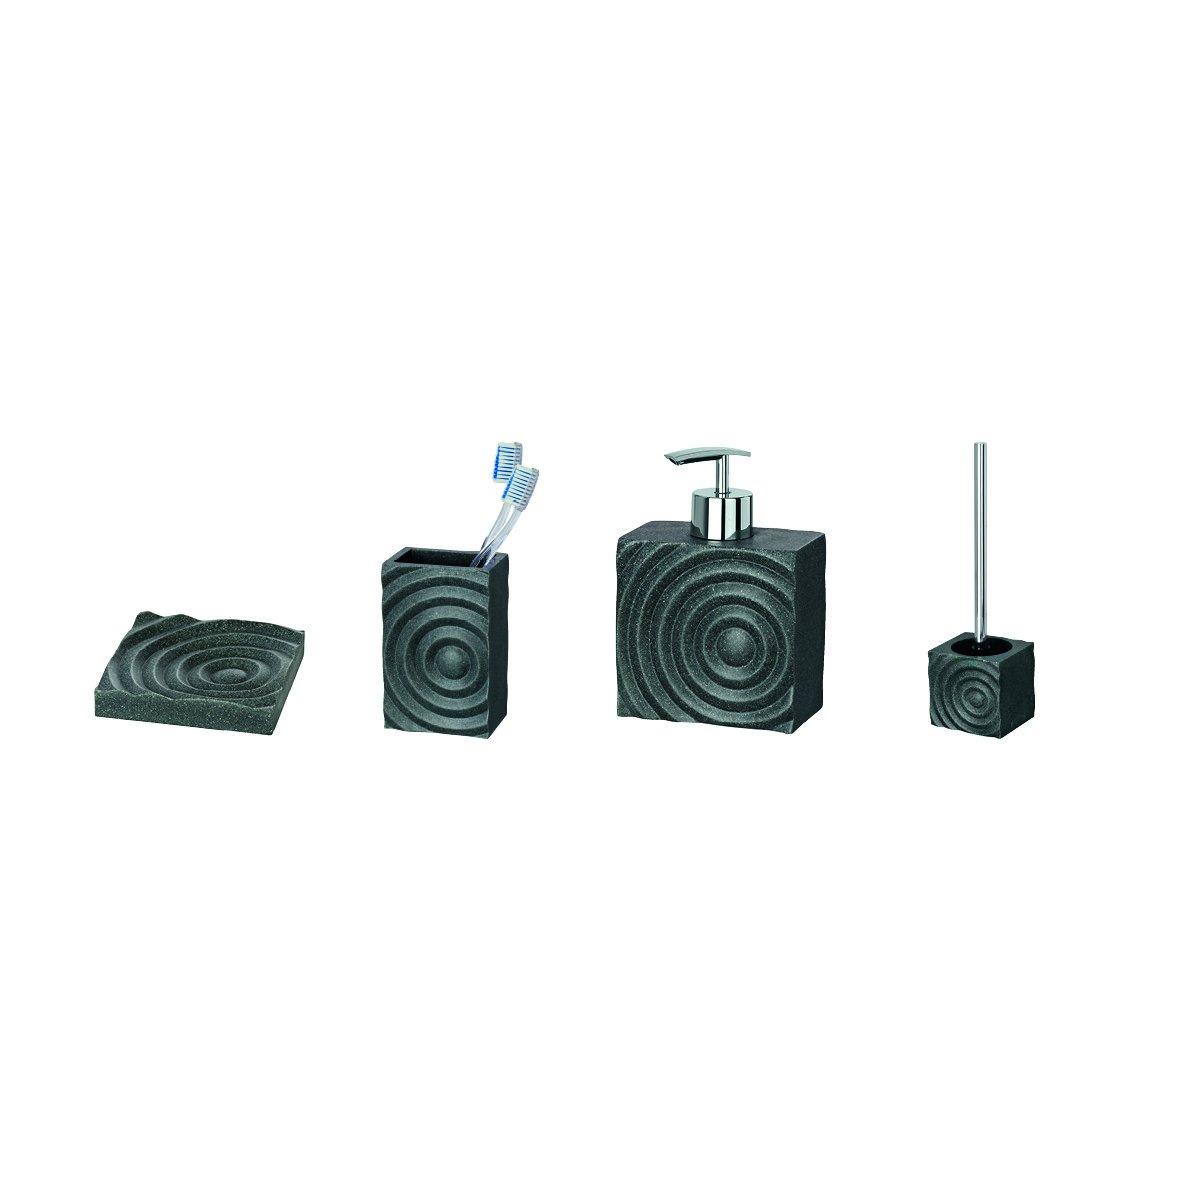 Wenko 21287100 Signs Brosse WC Noir Dimensions 10,5 x 9,5 x 37 cm